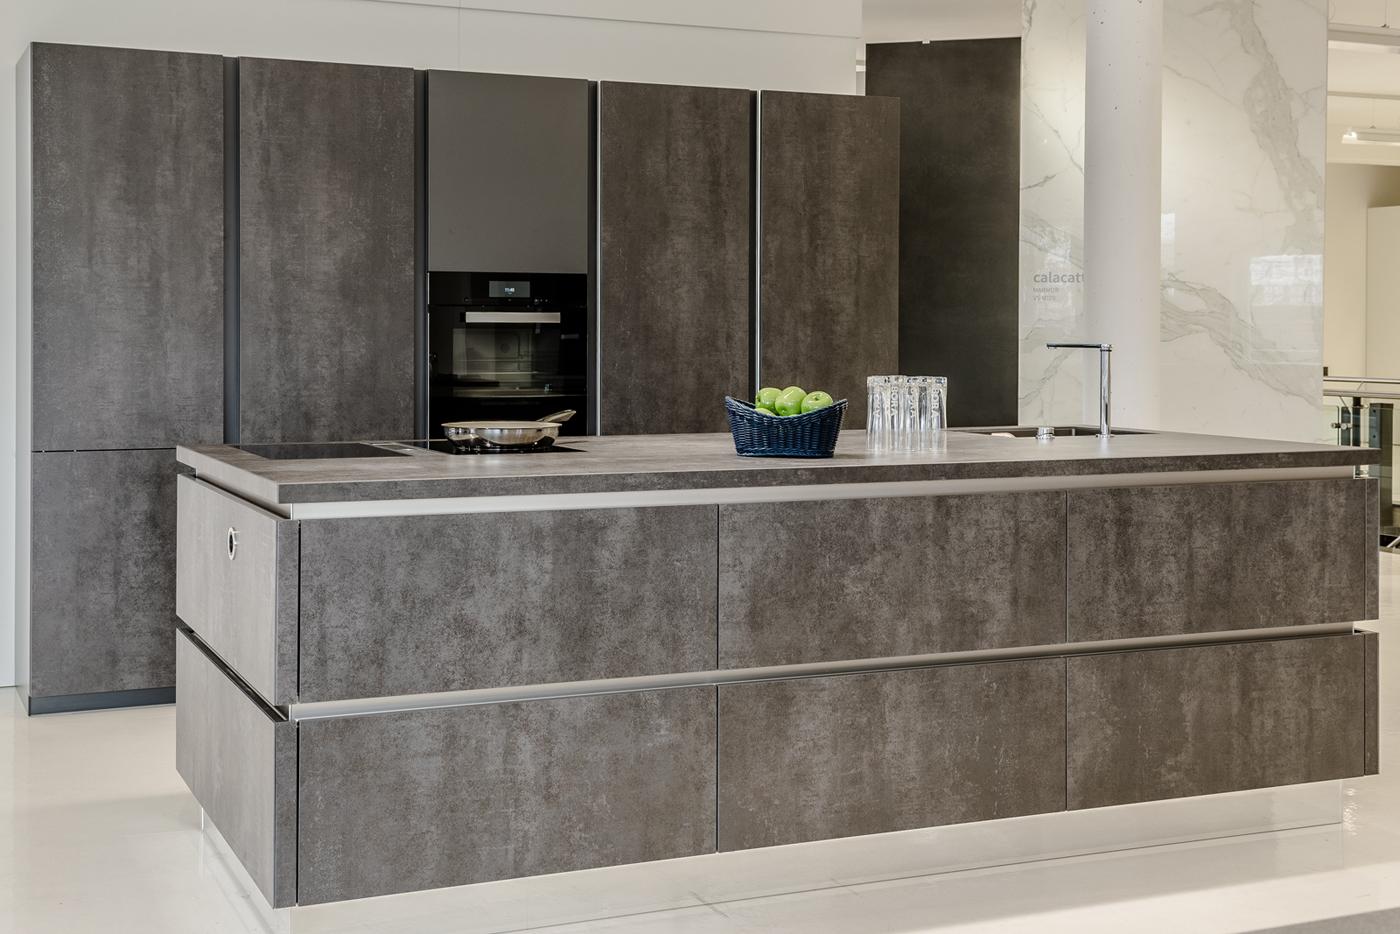 bora classic set b hm interieur abverkauf. Black Bedroom Furniture Sets. Home Design Ideas